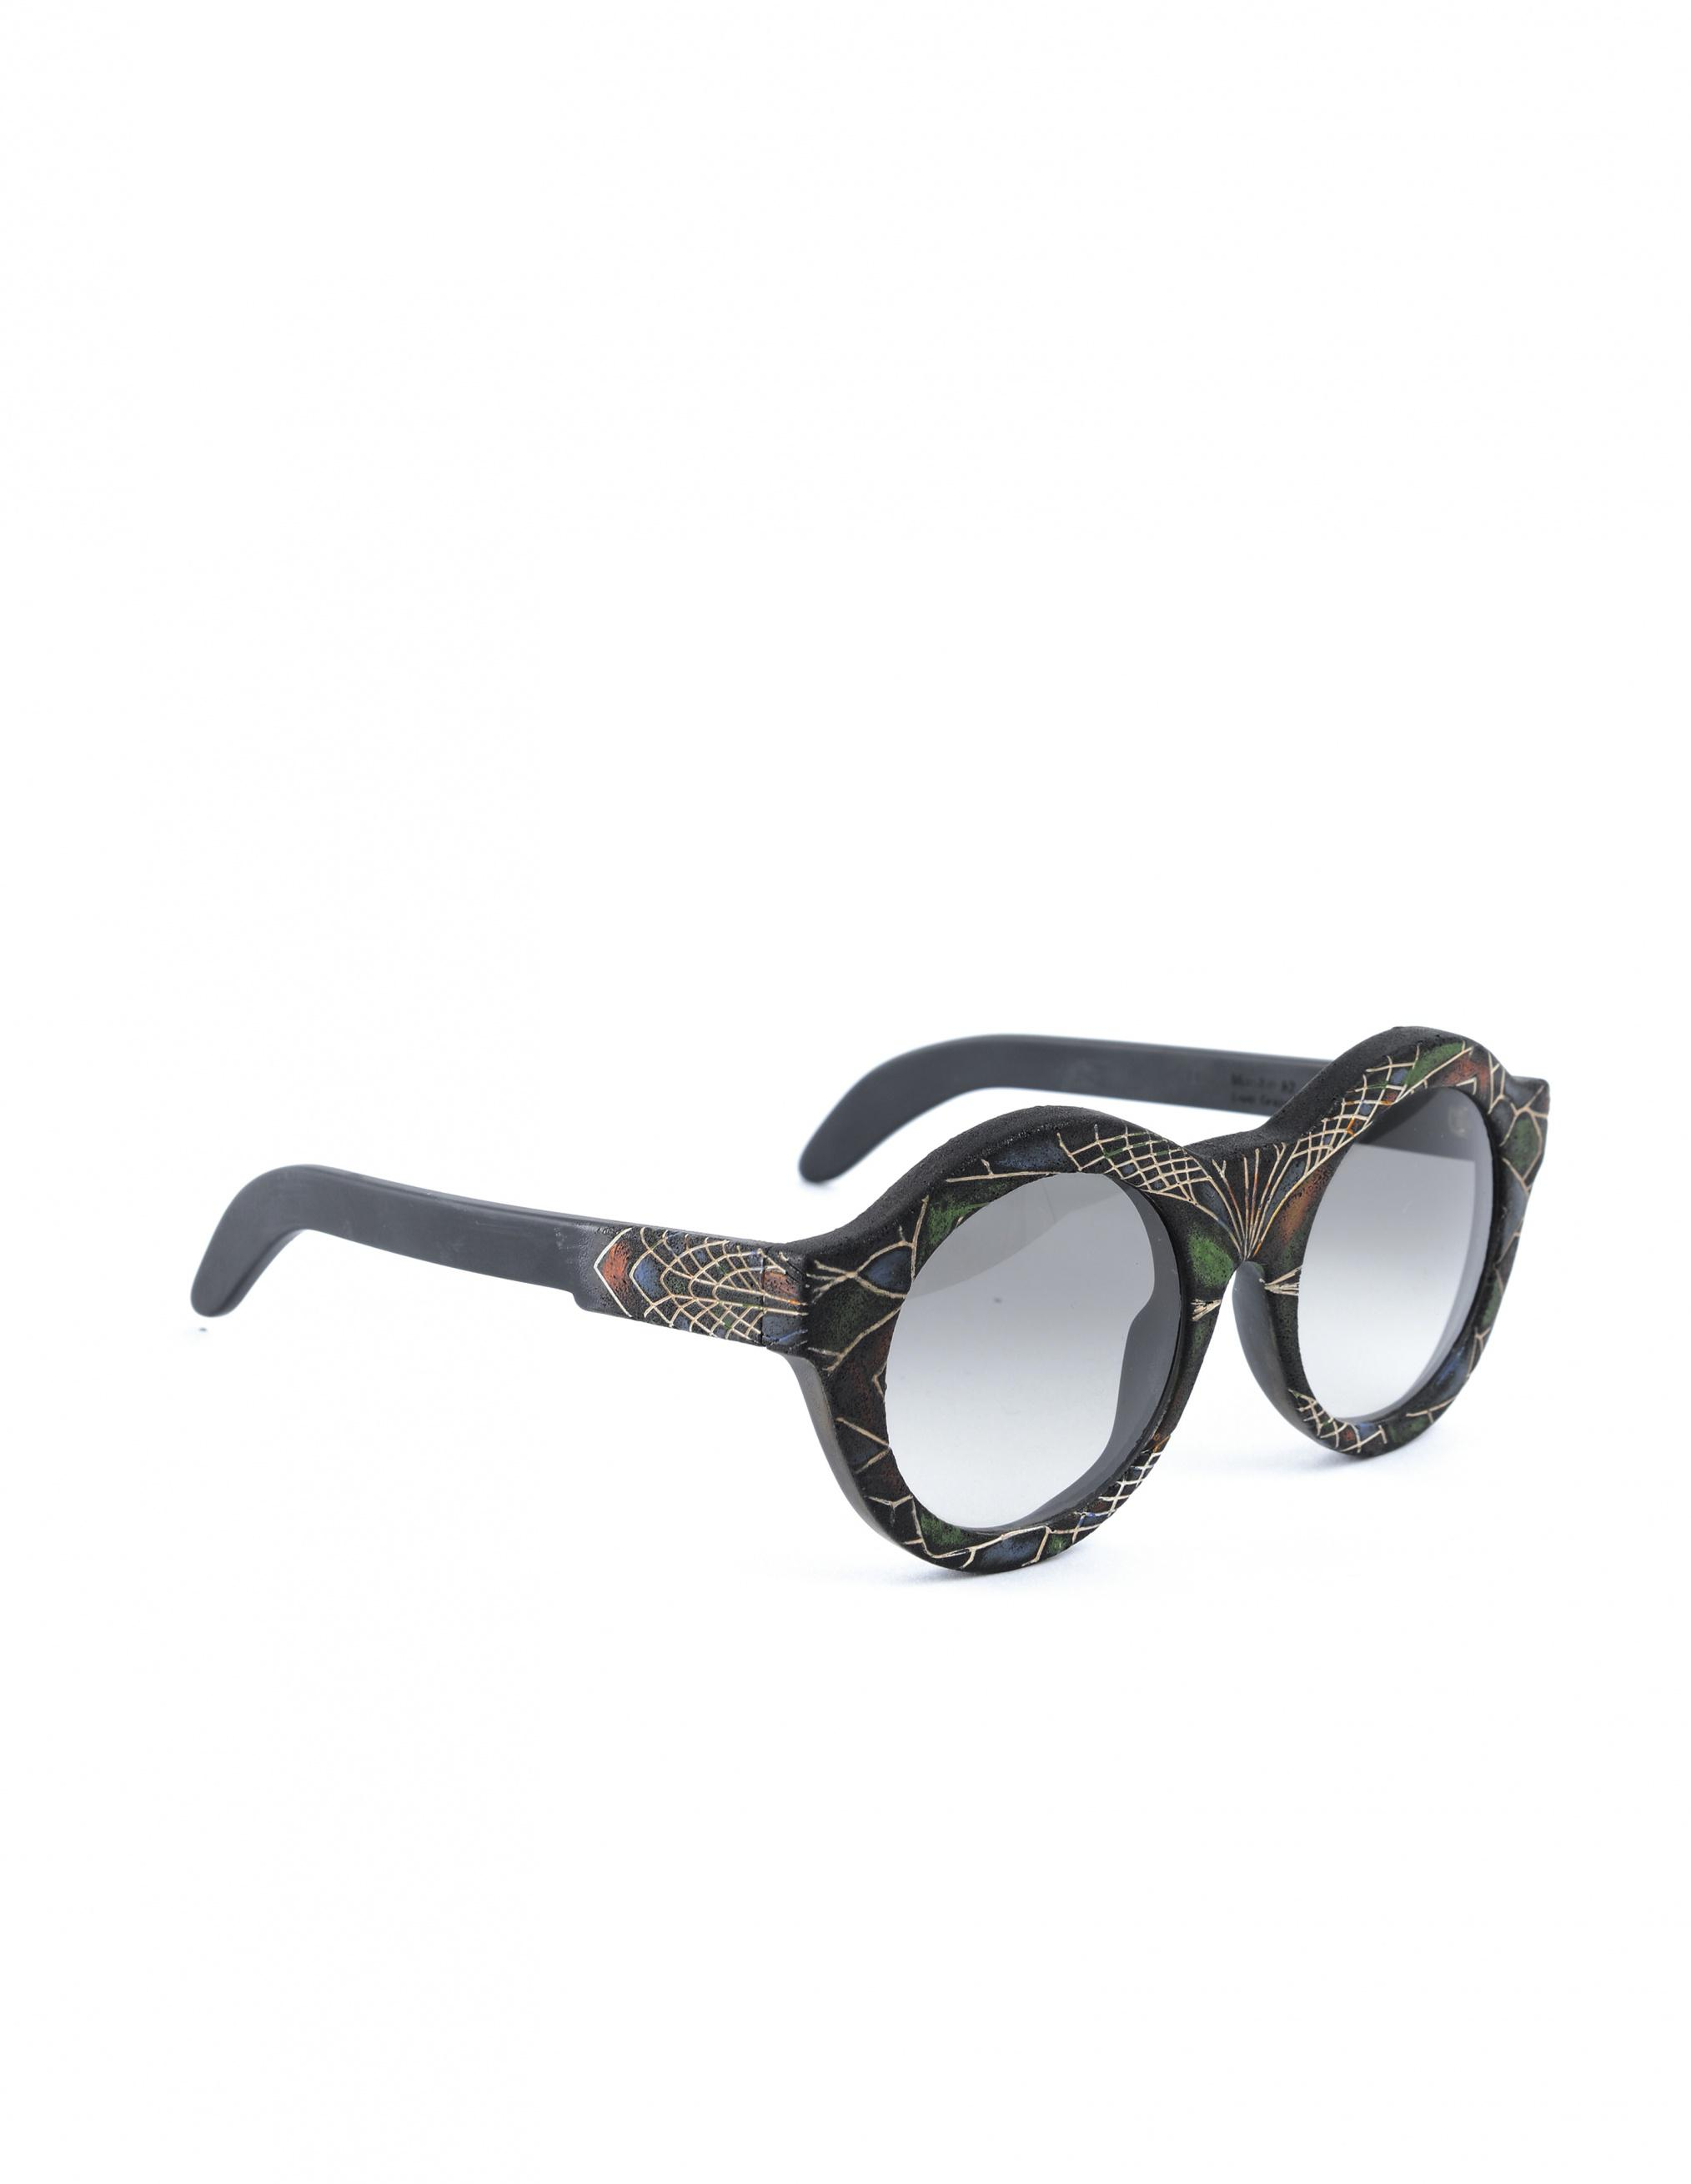 316d80485d0 Kuboraum Sunglasses A2 in Green - Lyst